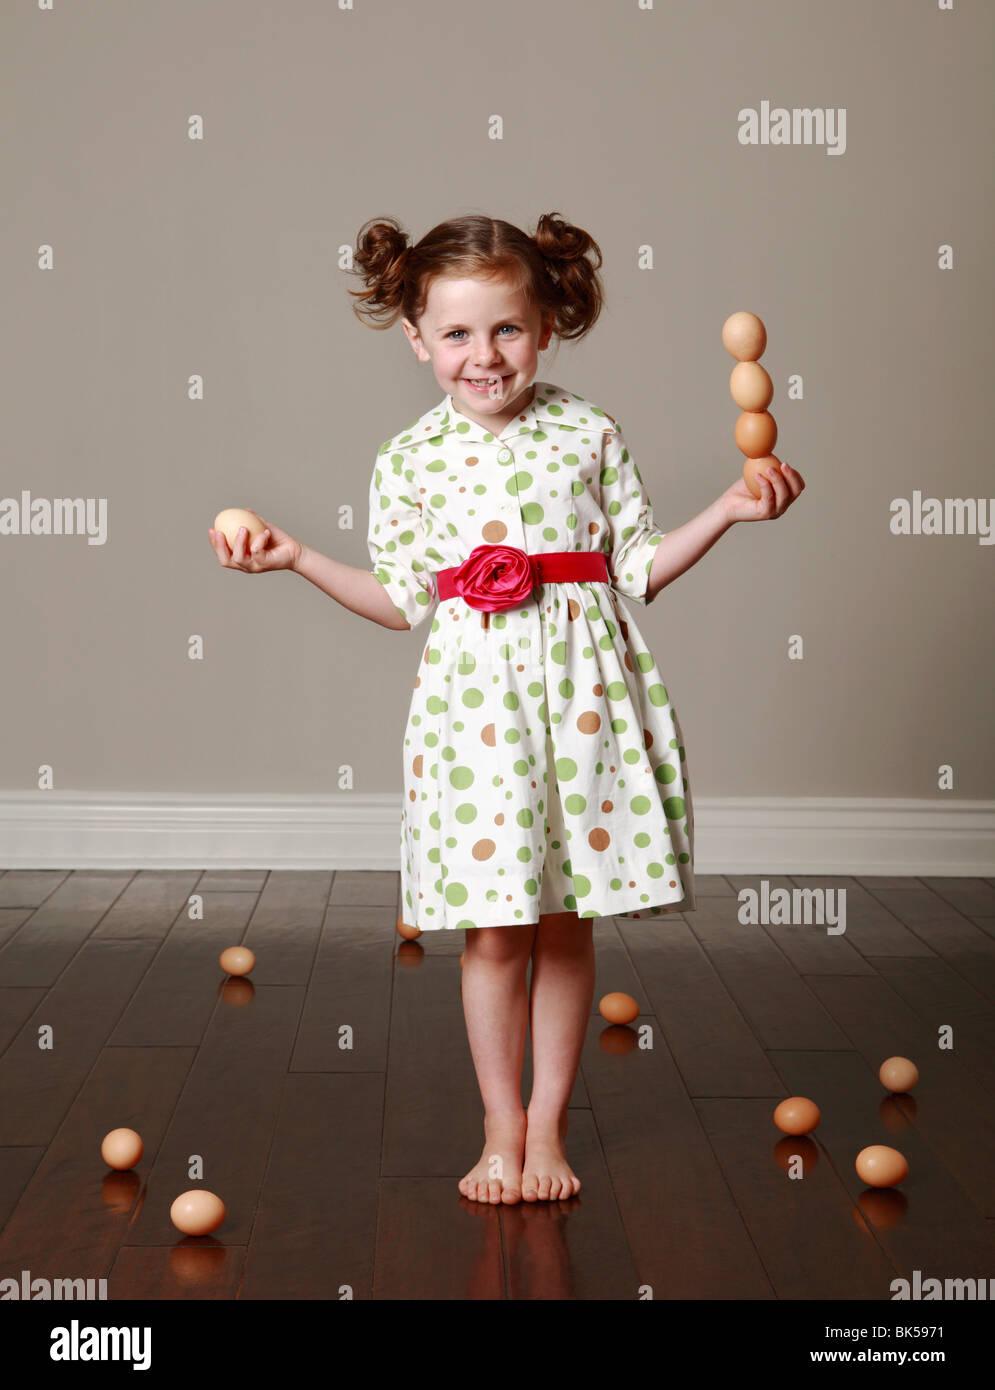 Girl in polka dot dress balancing eggs - Stock Image